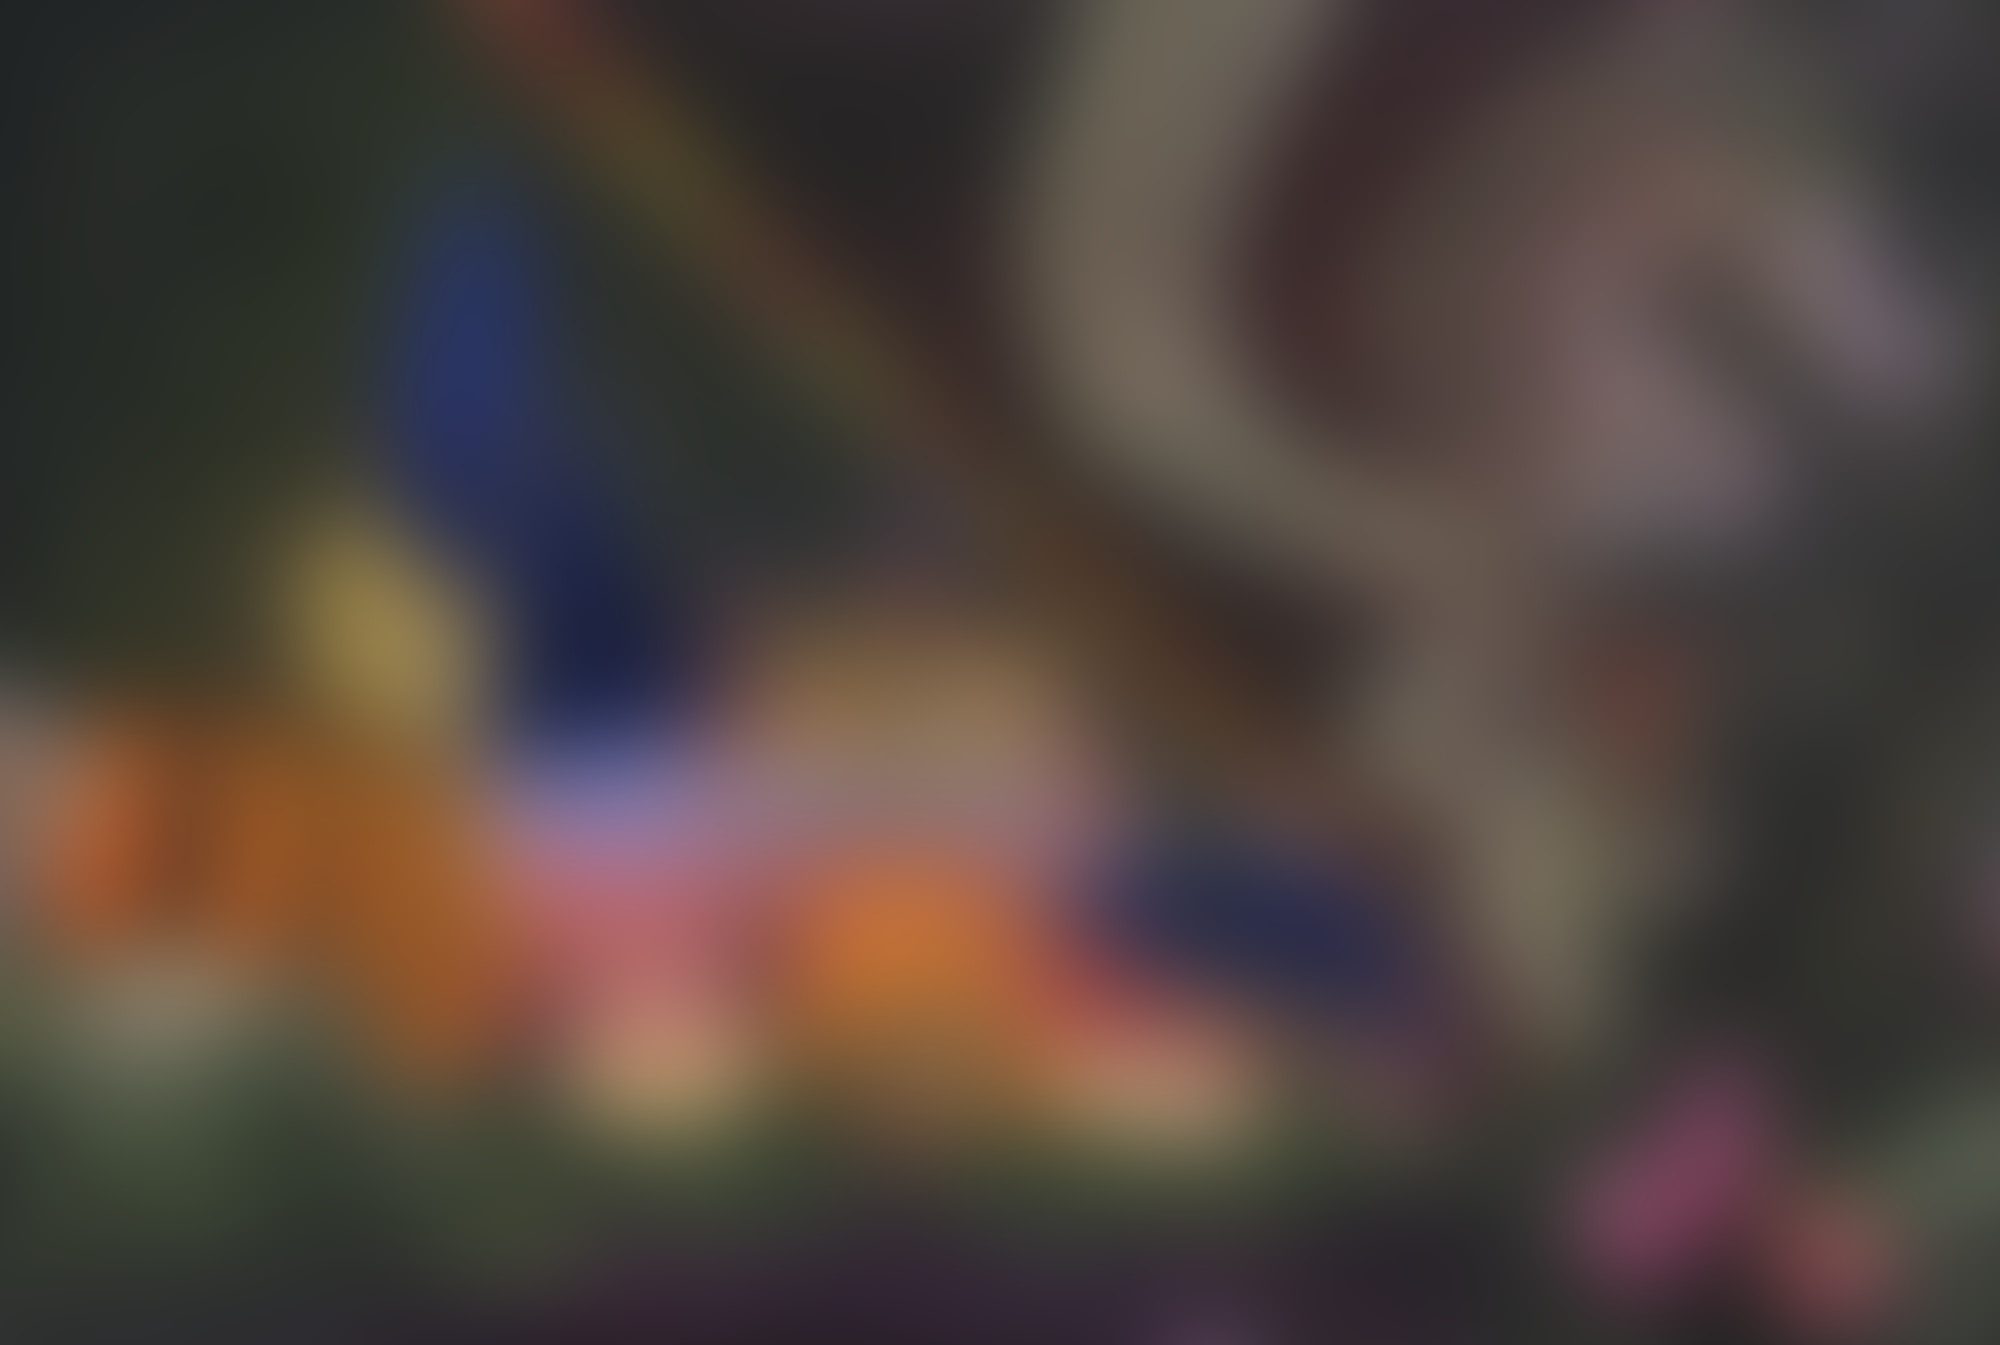 Alice tye illustration oil paints las vegas 2019 hello america lectureinprogress 01 autocompressfitresizeixlibphp 1 1 0max h2000max w3 D2000q80s4345b3cda1416c8746f774a753fdac0e